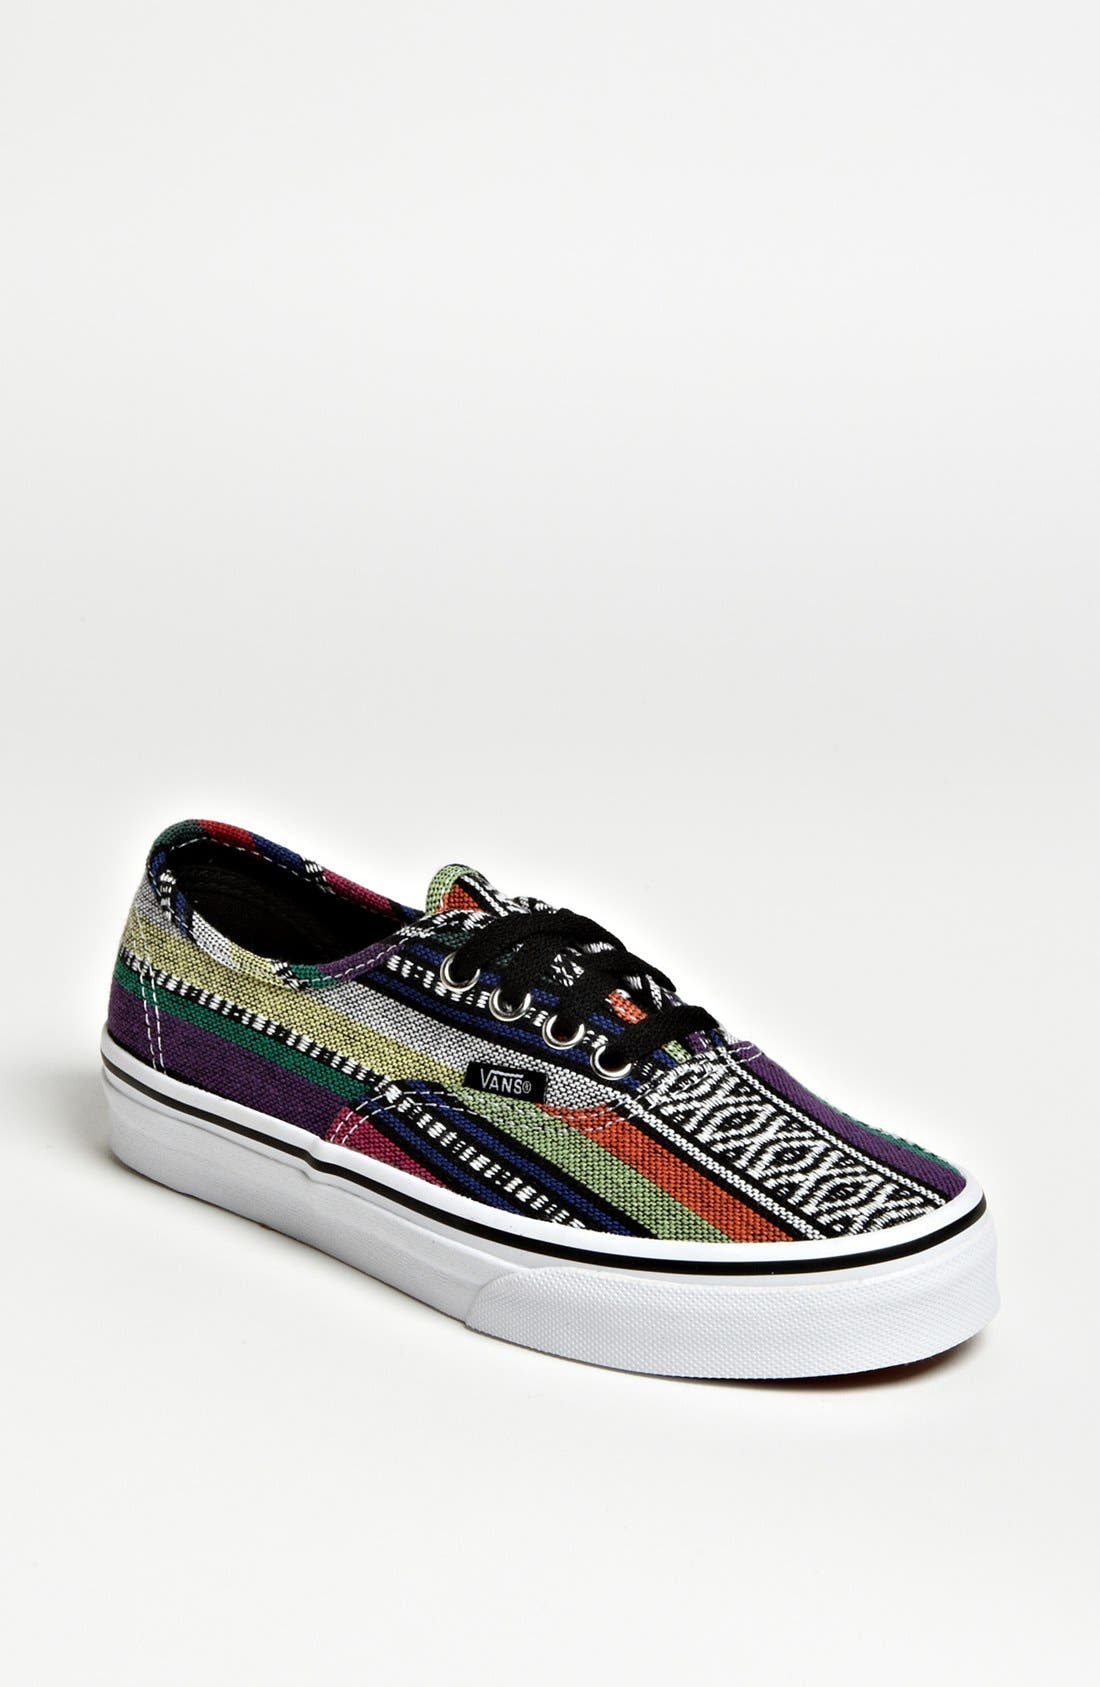 Main Image - Vans 'Authentic - Guata' Sneaker (Women)